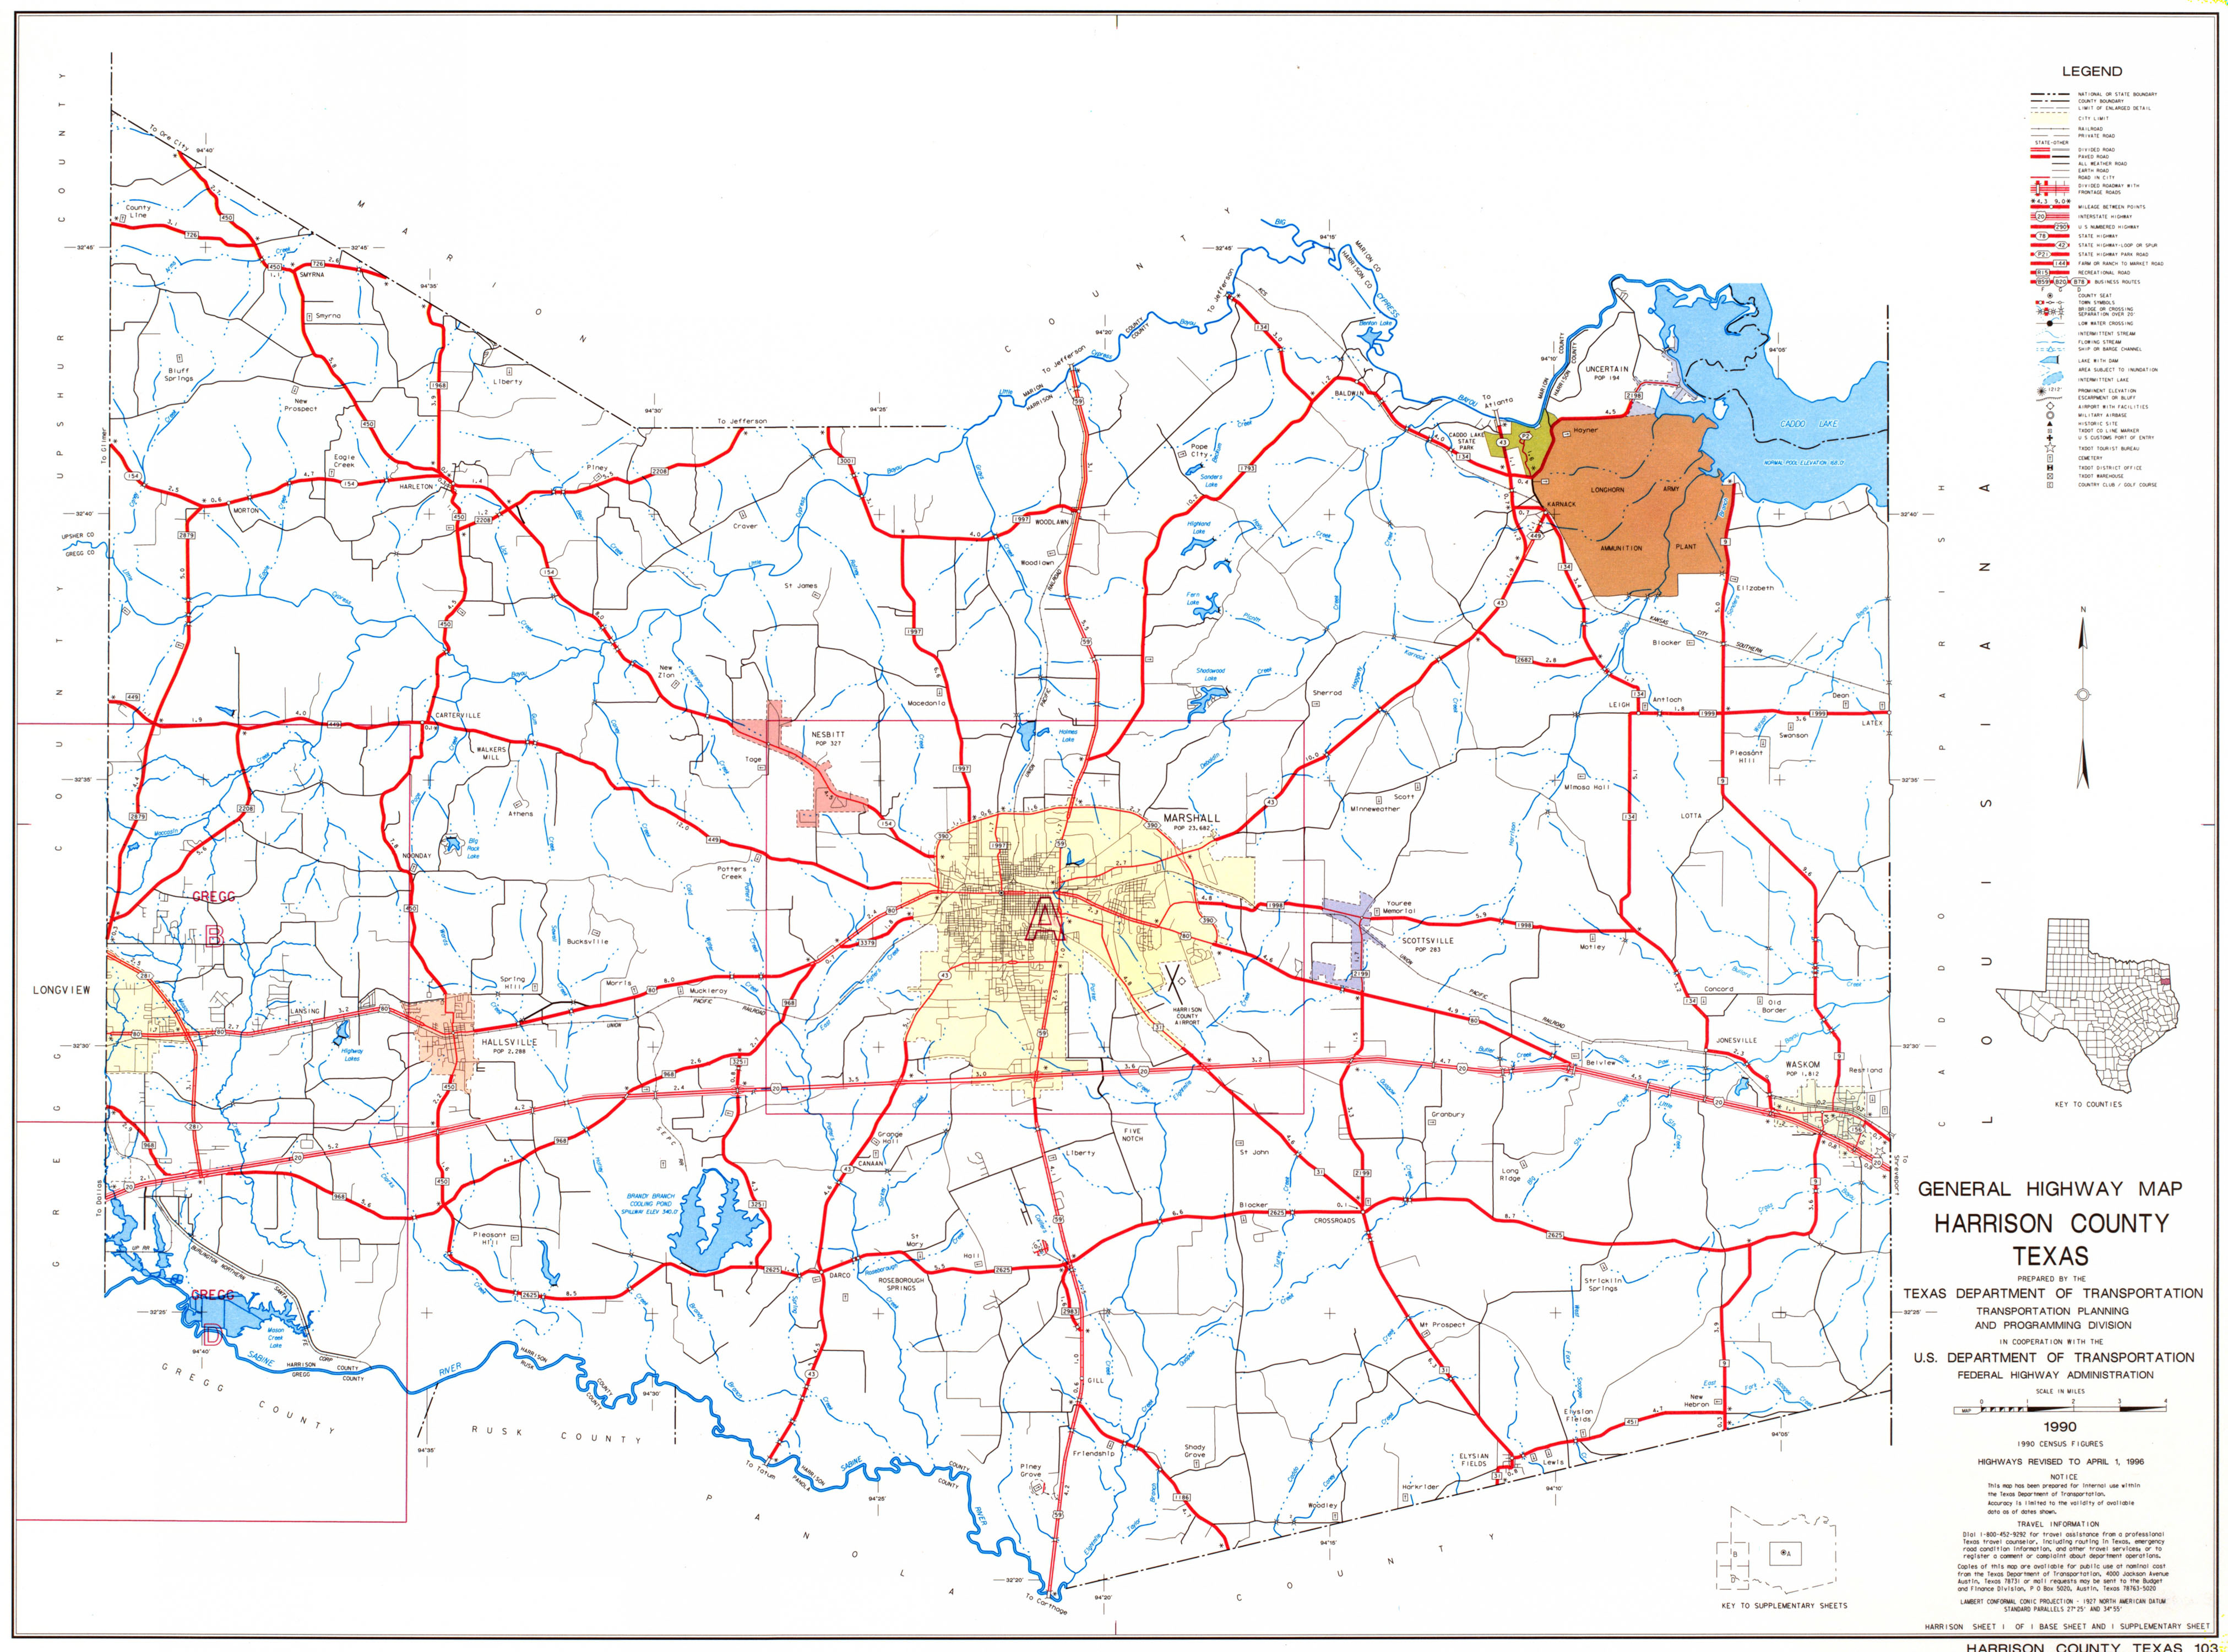 Harrison County Texas Map